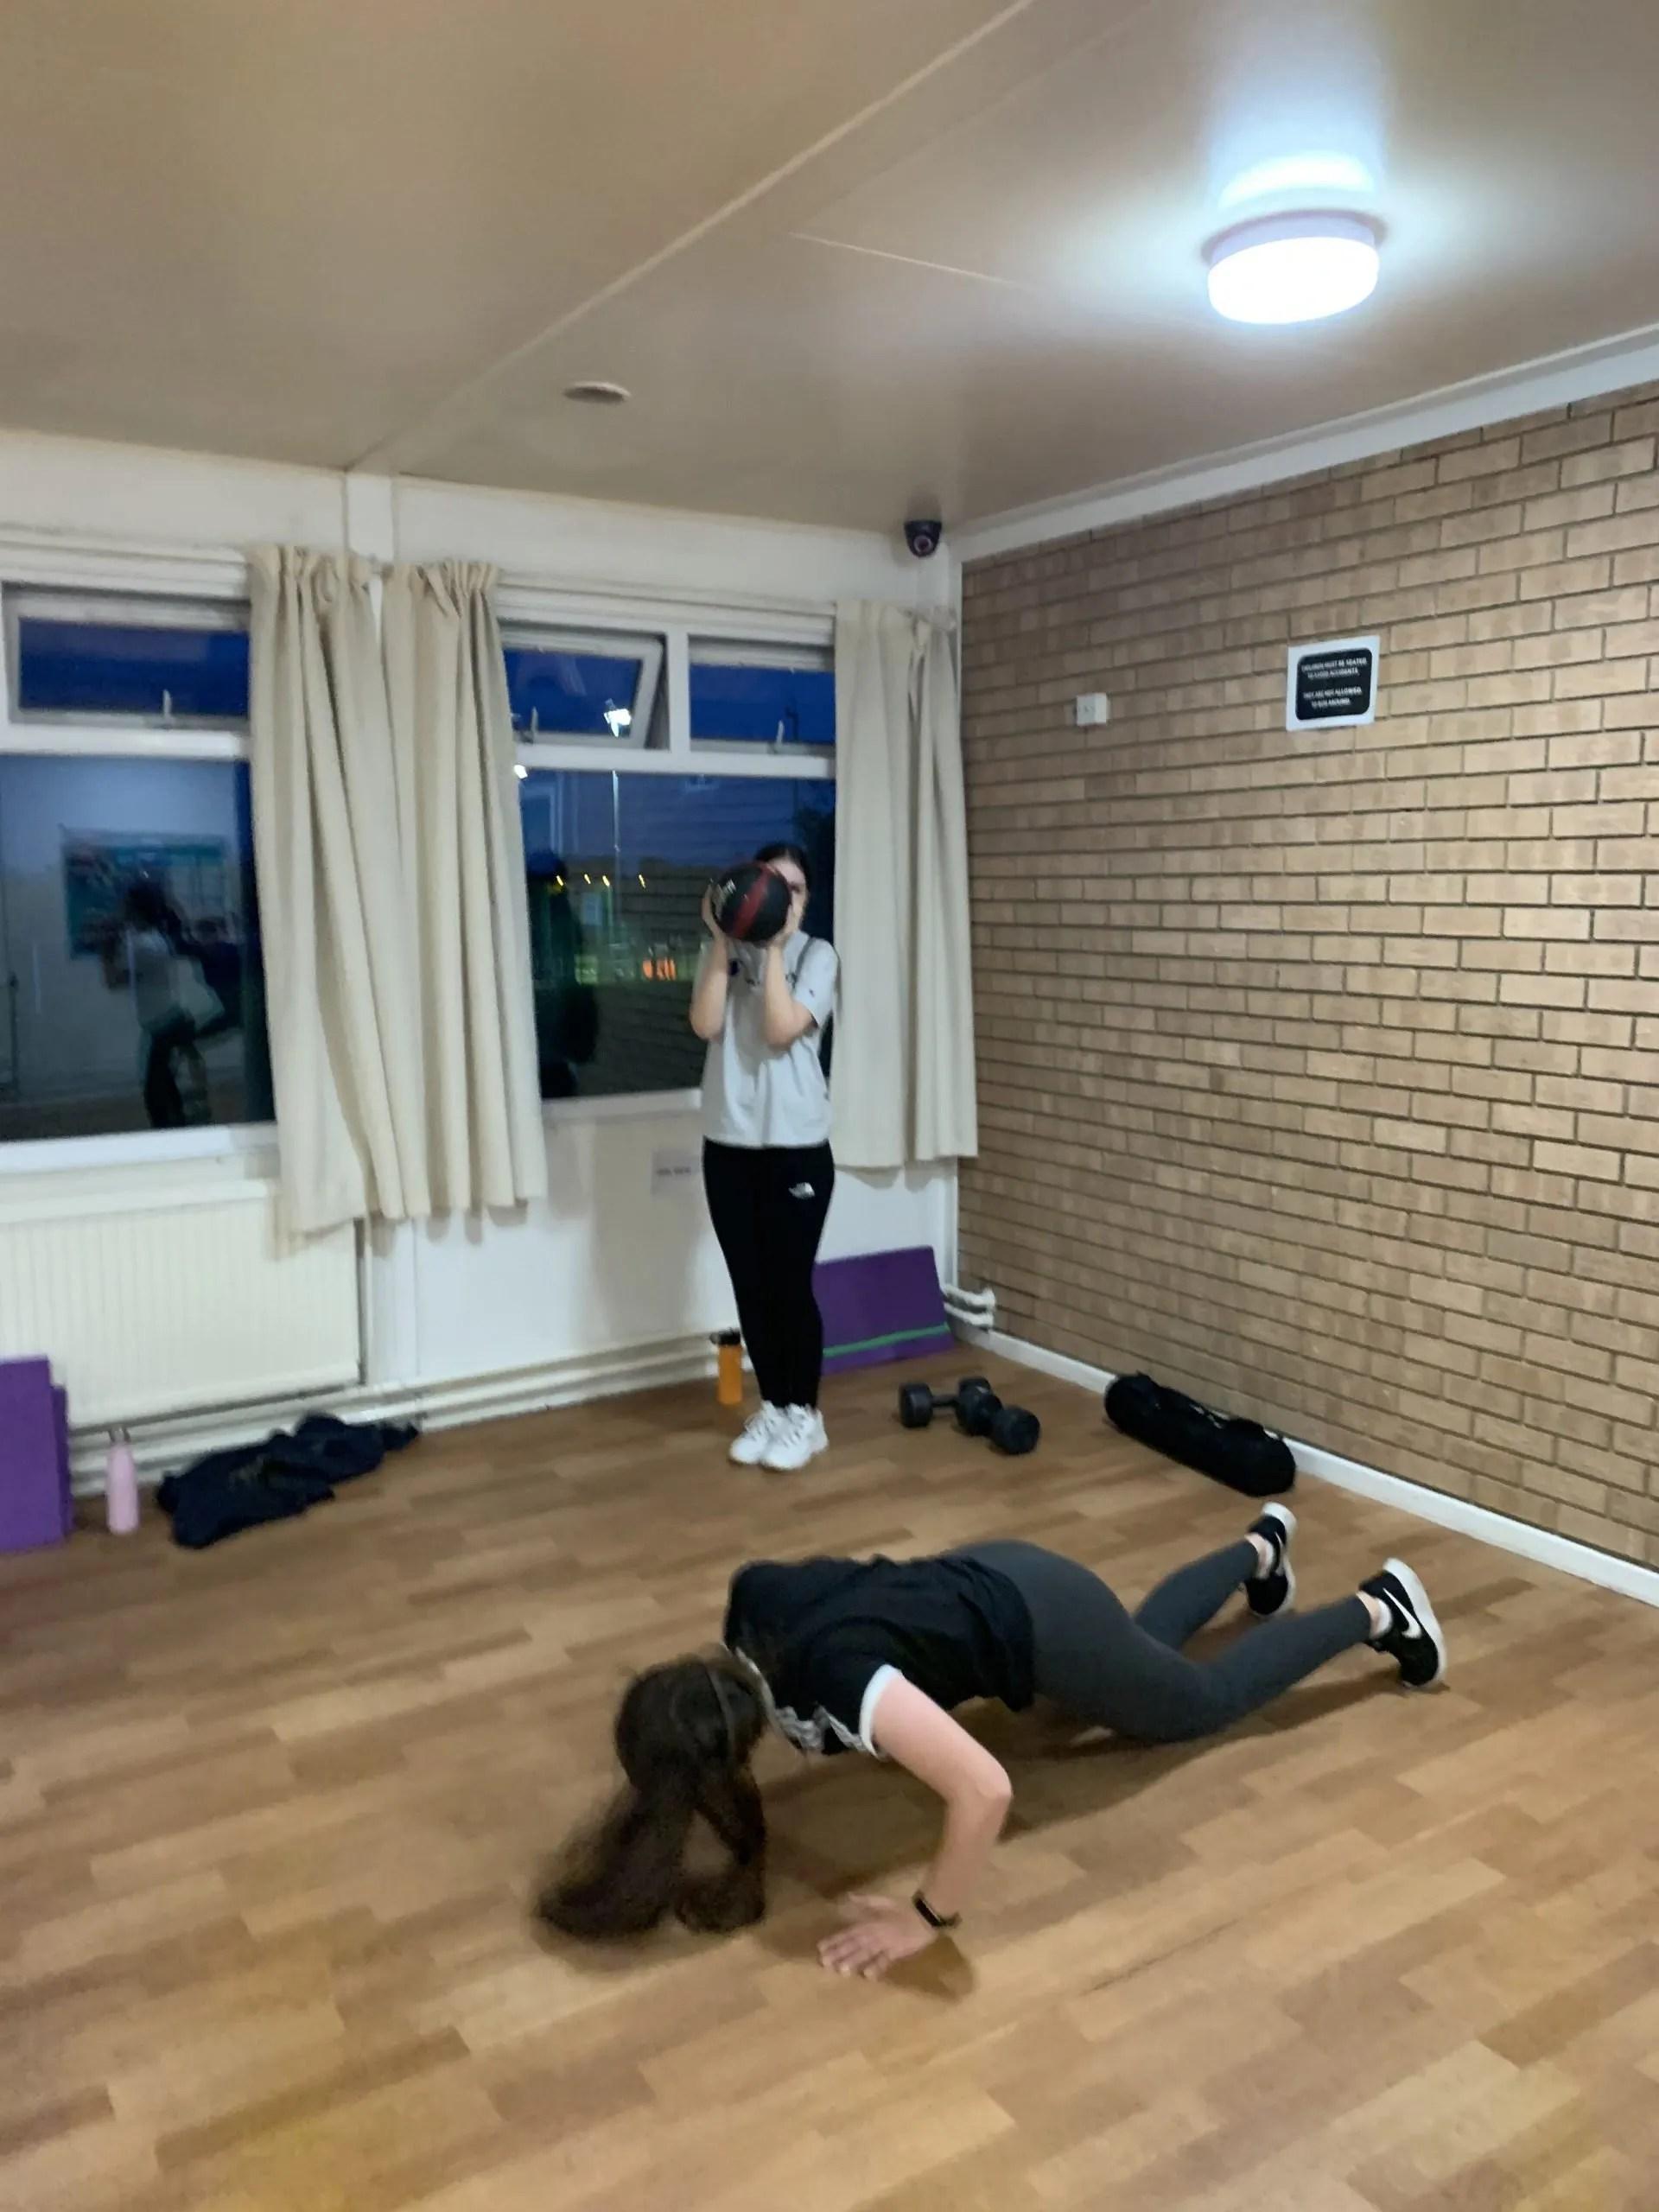 Personal trainer class in Leeds